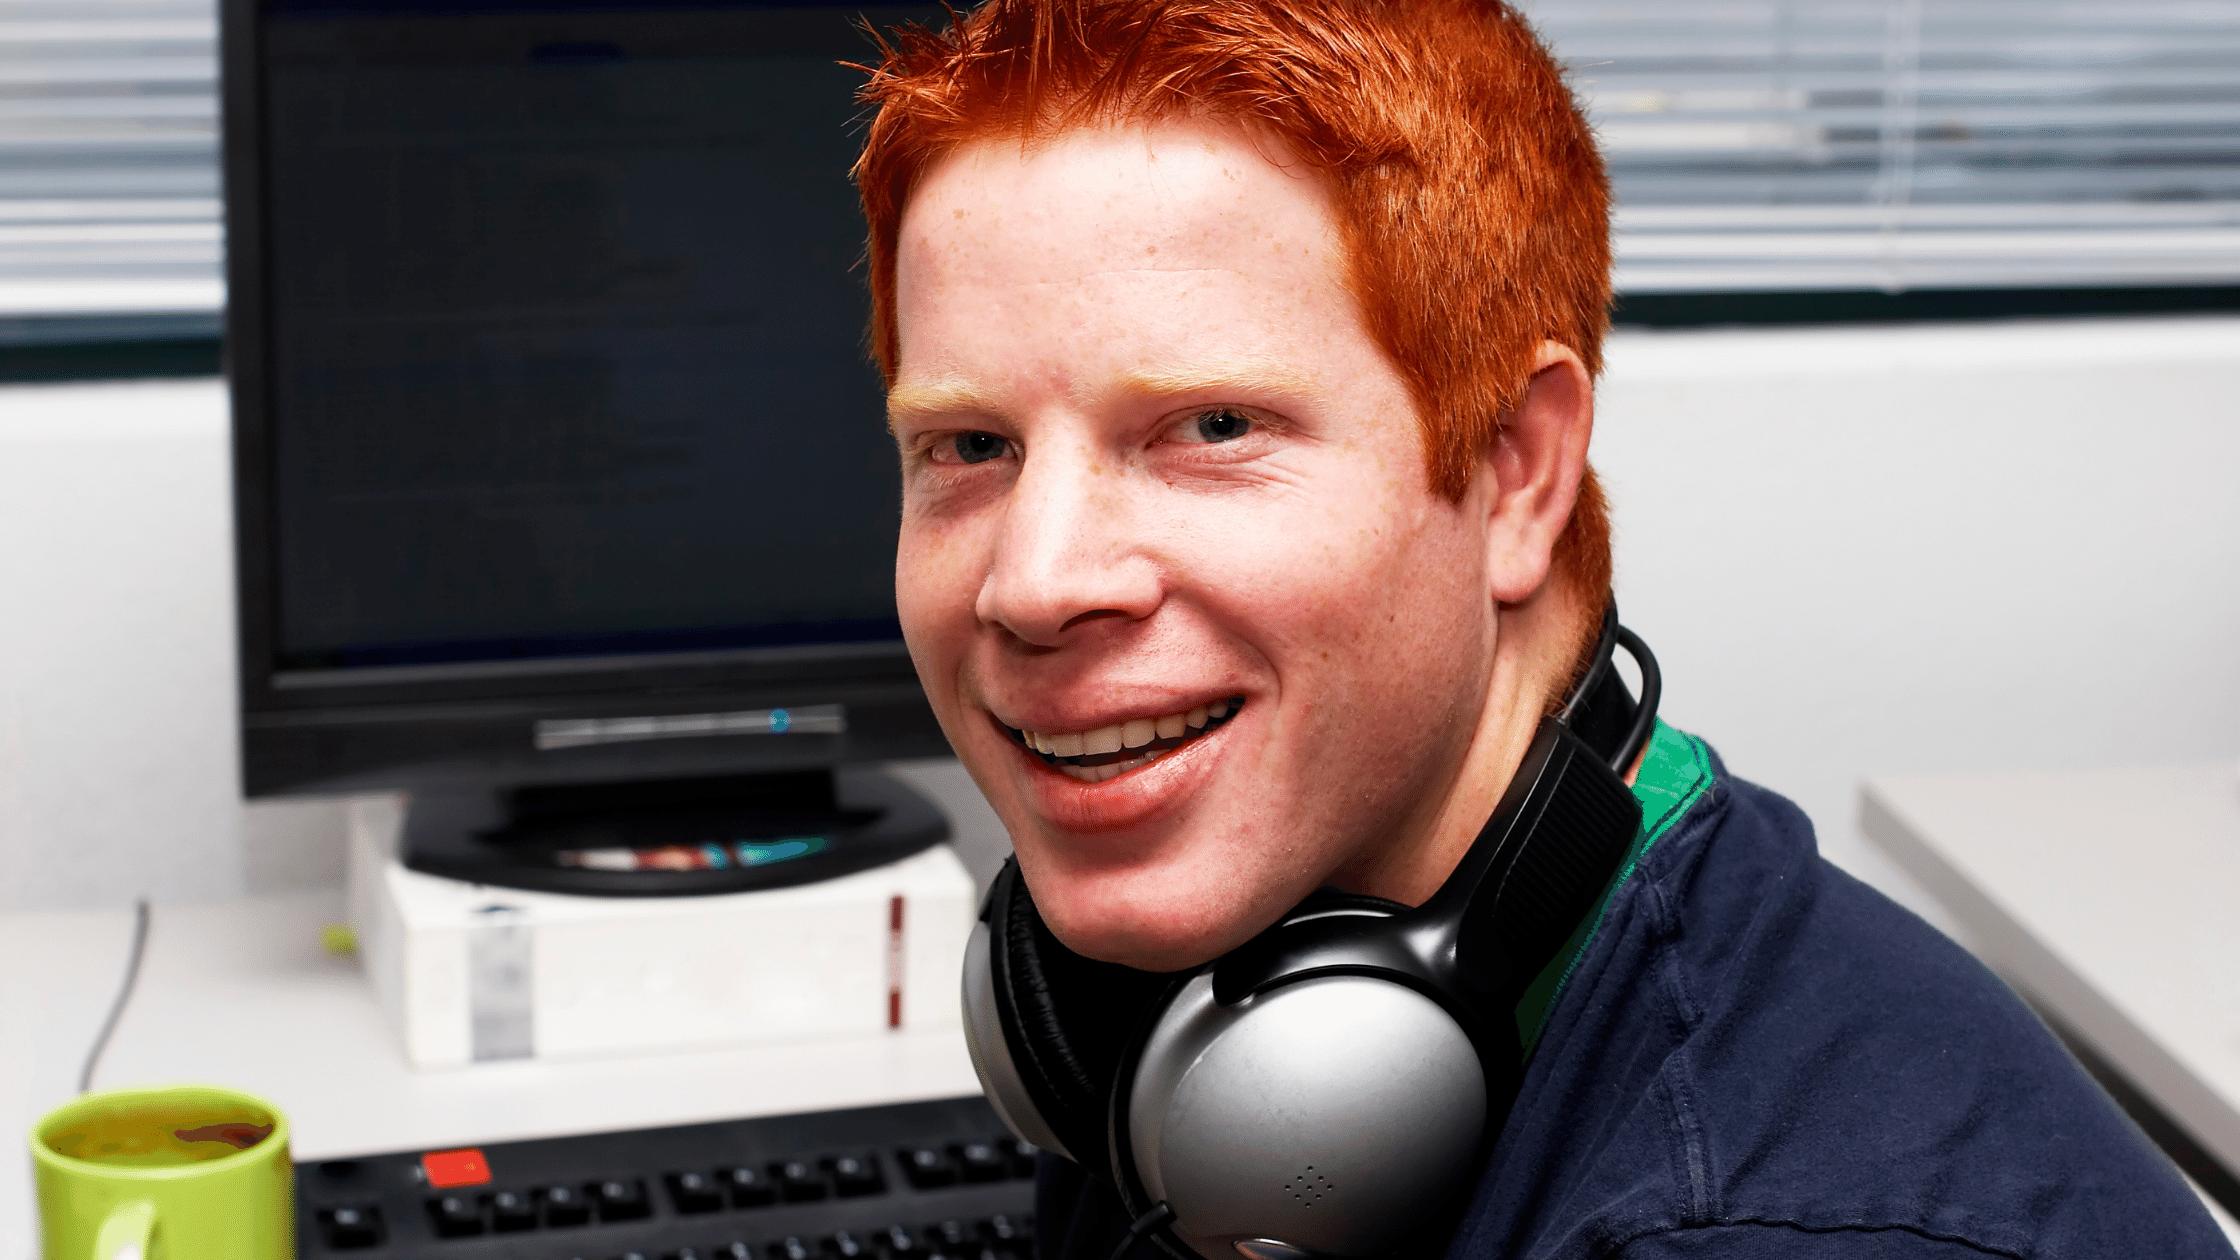 Programmer smiling at computer